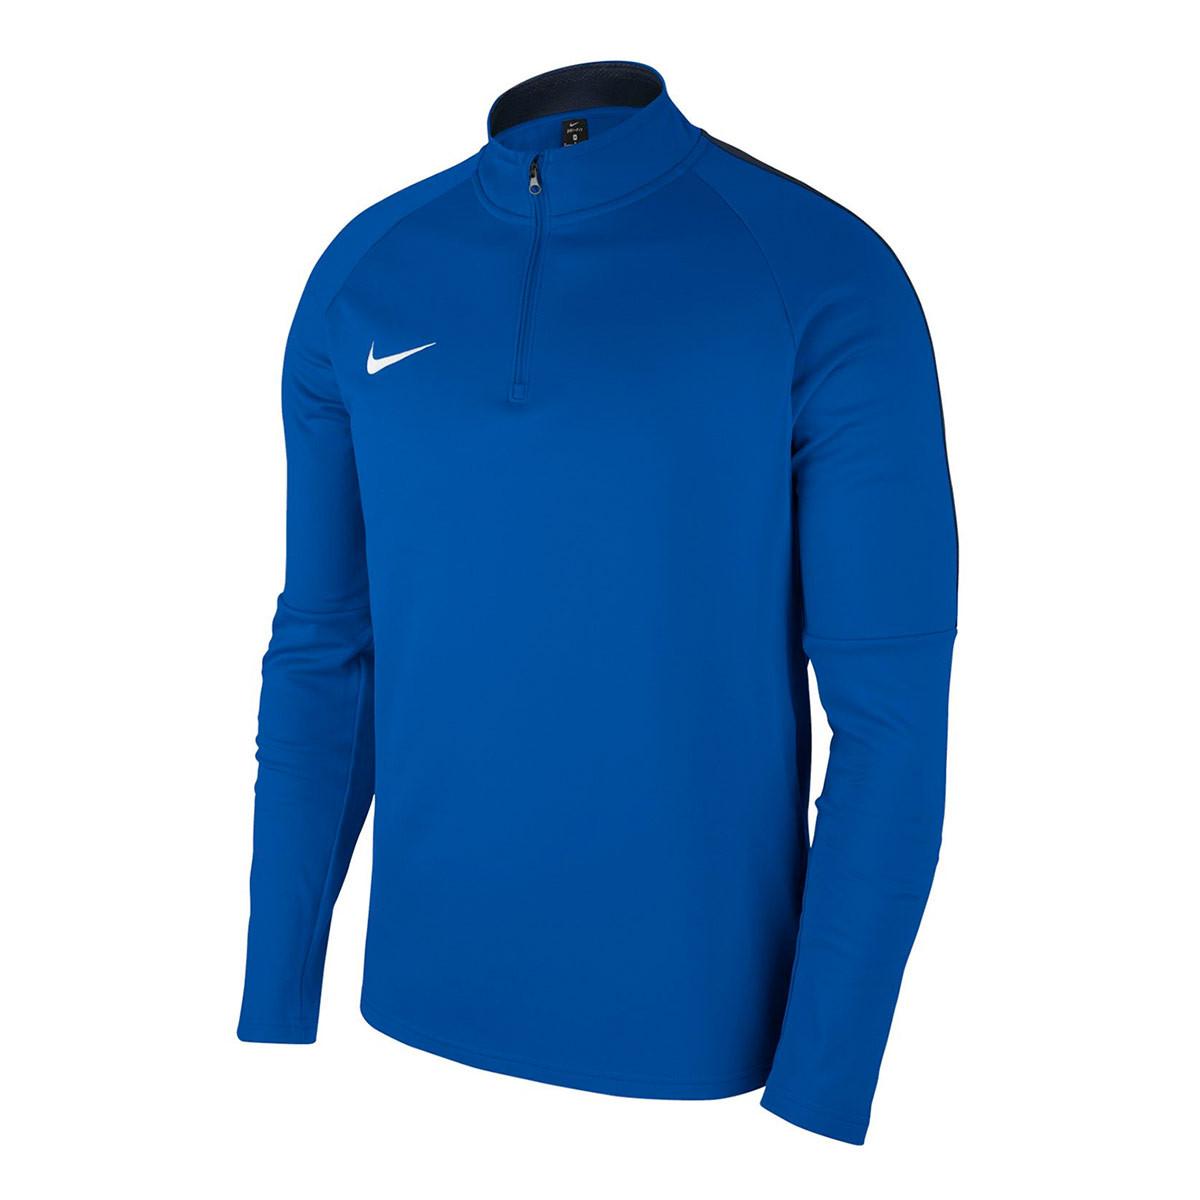 f59050ceb55 Nike Kids Academy 18 Drill Sweatshirt. Royal blue-Obsidian-White ...